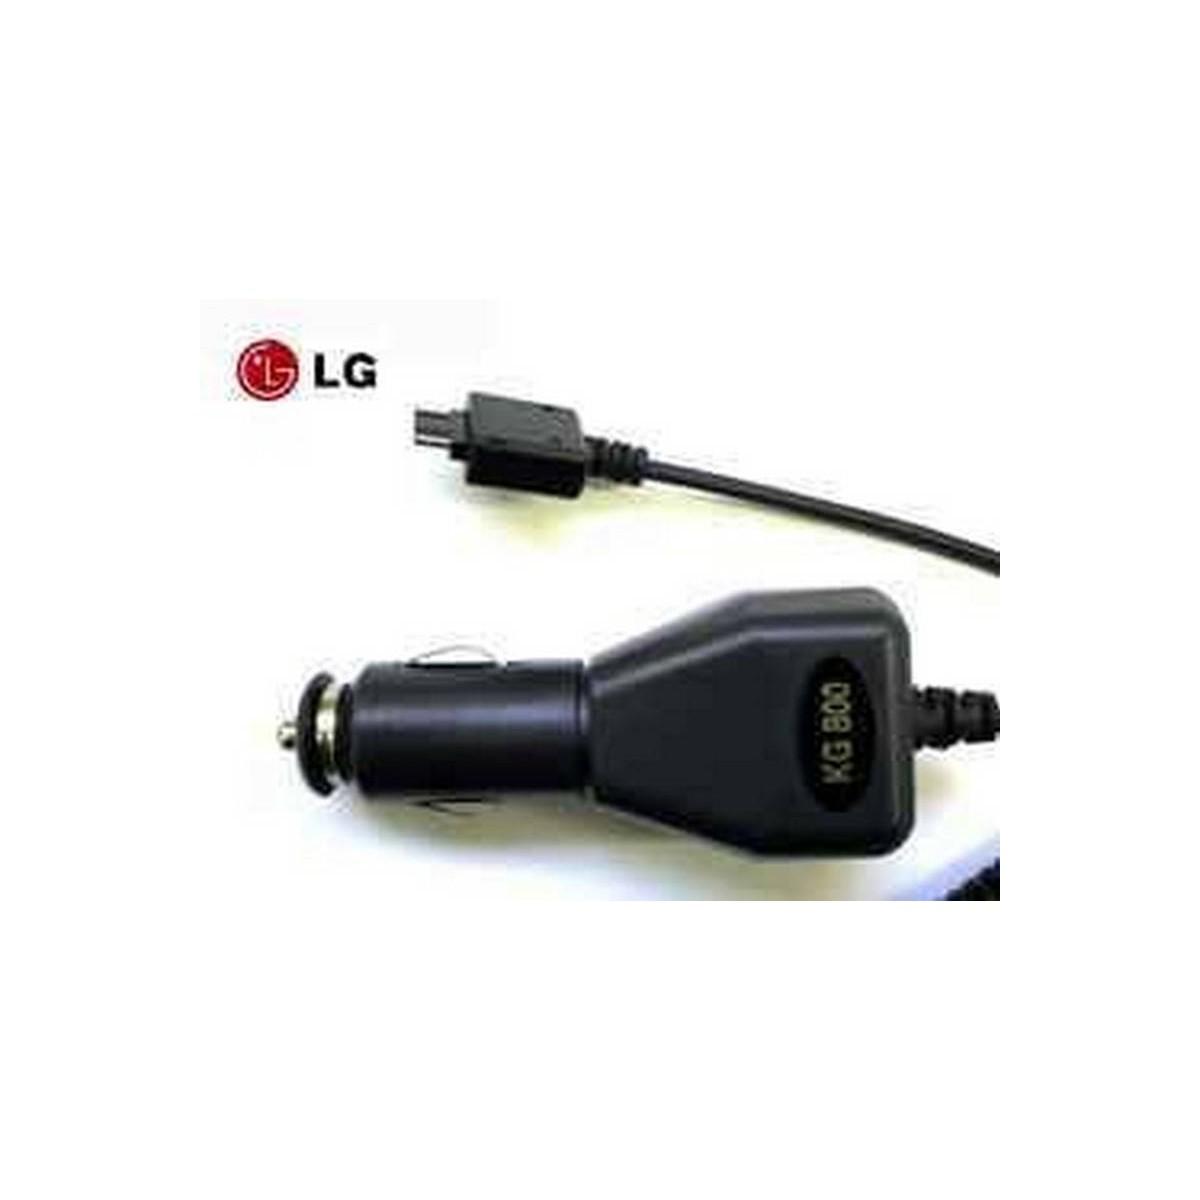 LG KG800, KU990 Cargador vehiculo coche